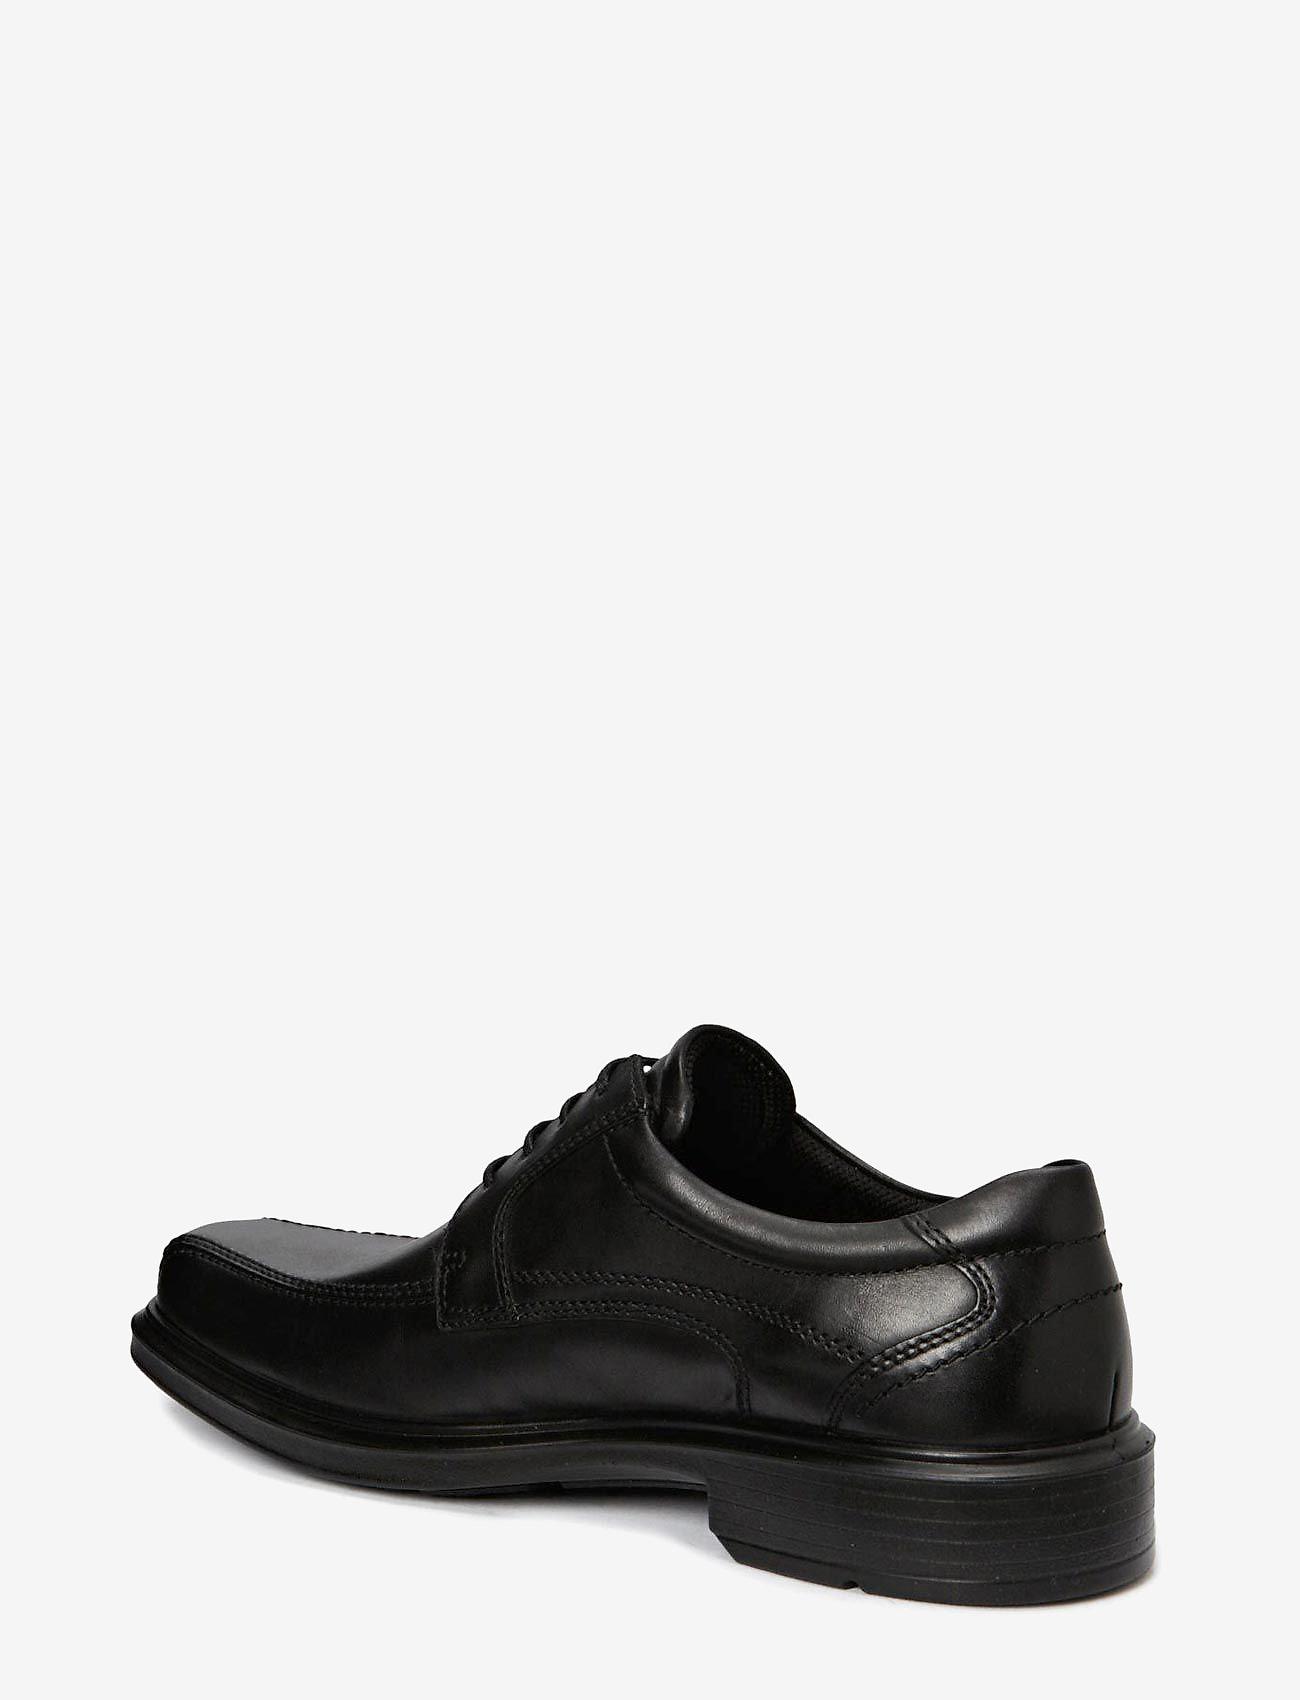 ECCO - HELSINKI - chaussures lacées - black